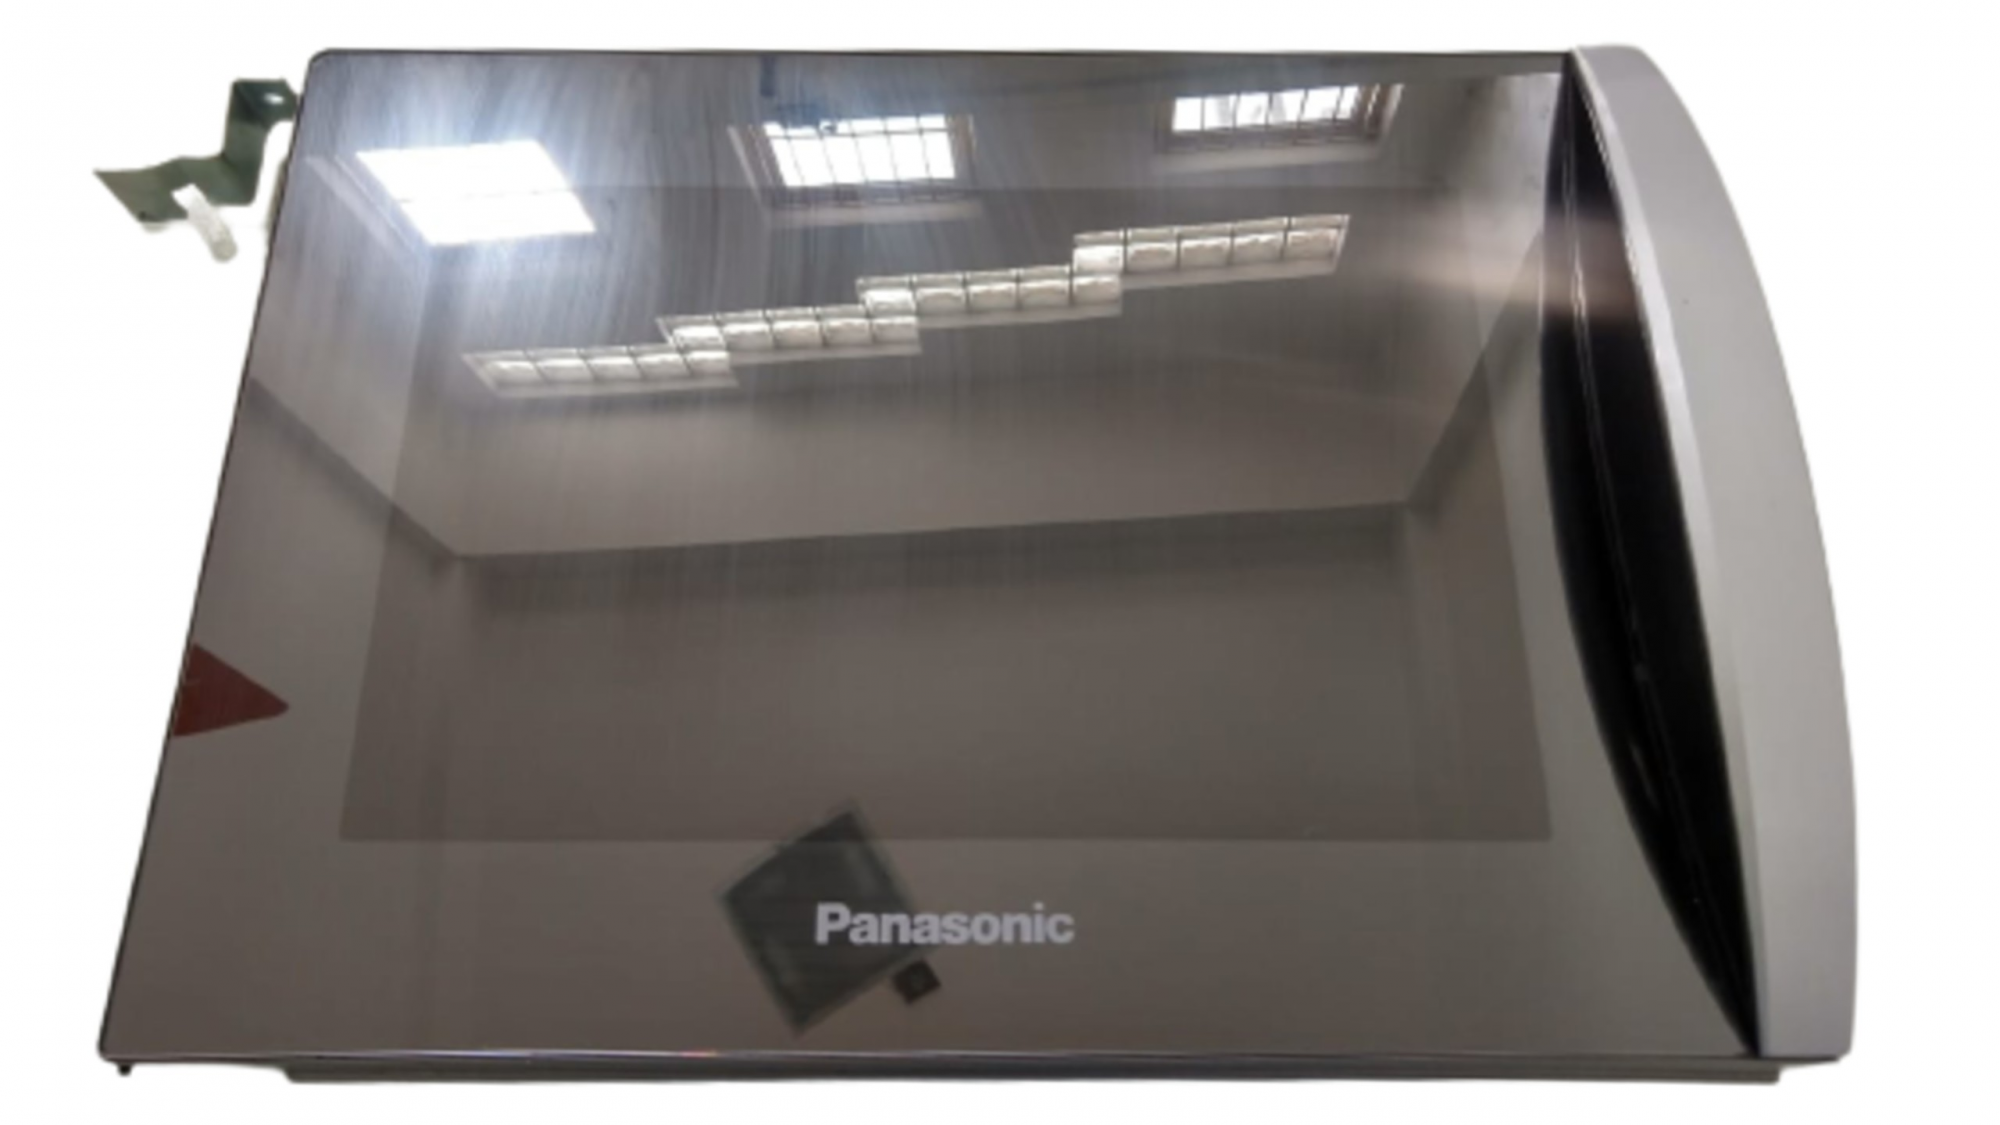 Porta Espelhada forno micro-ondas Style Panasonic REMANUFATURADO